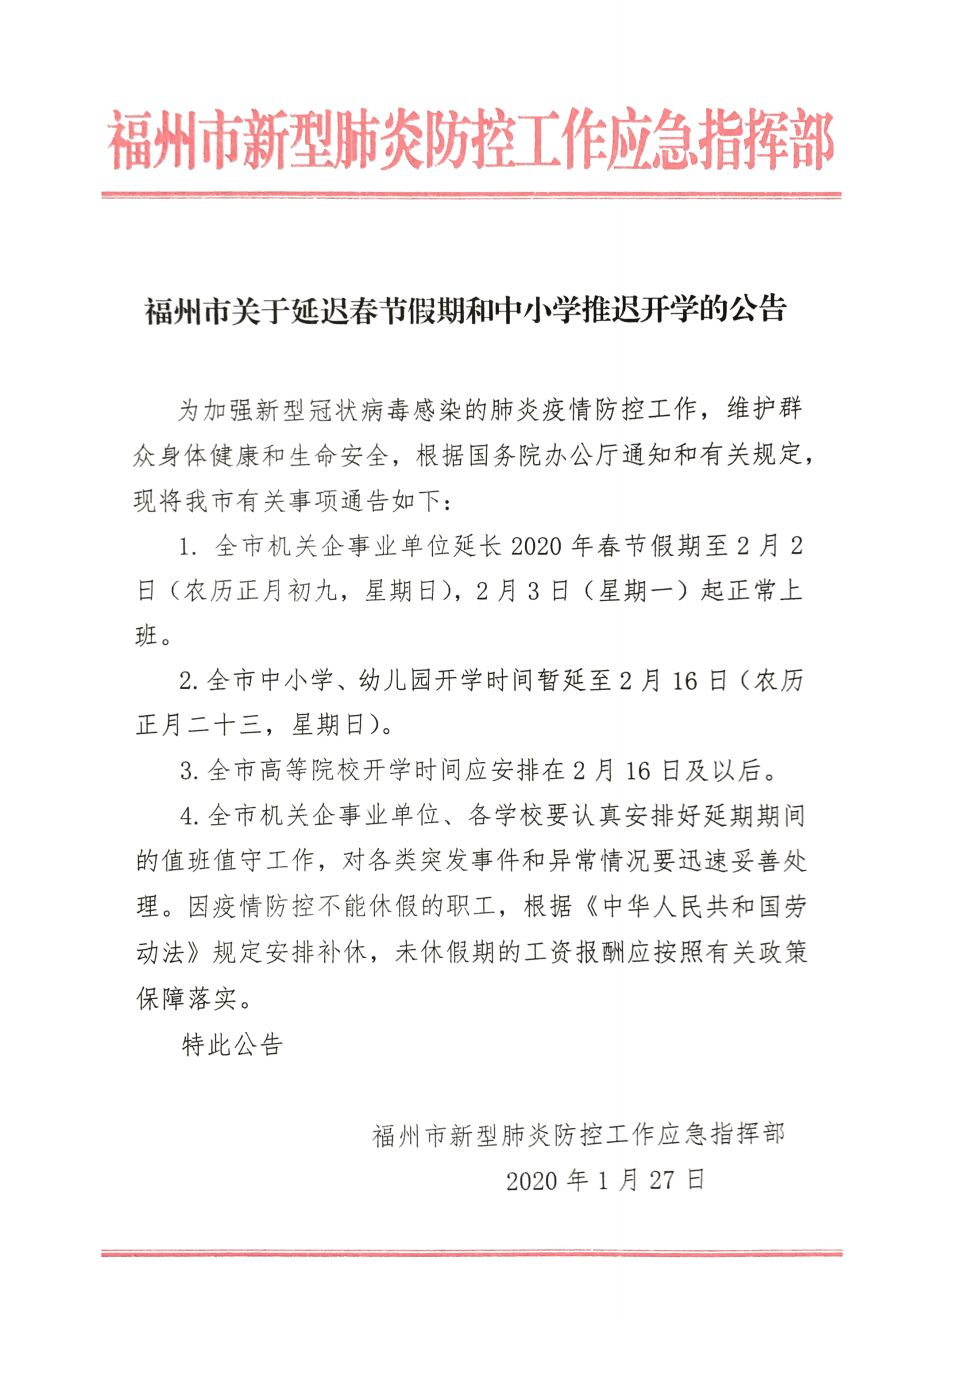 http://www.clzxc.com/changlejingji/16361.html